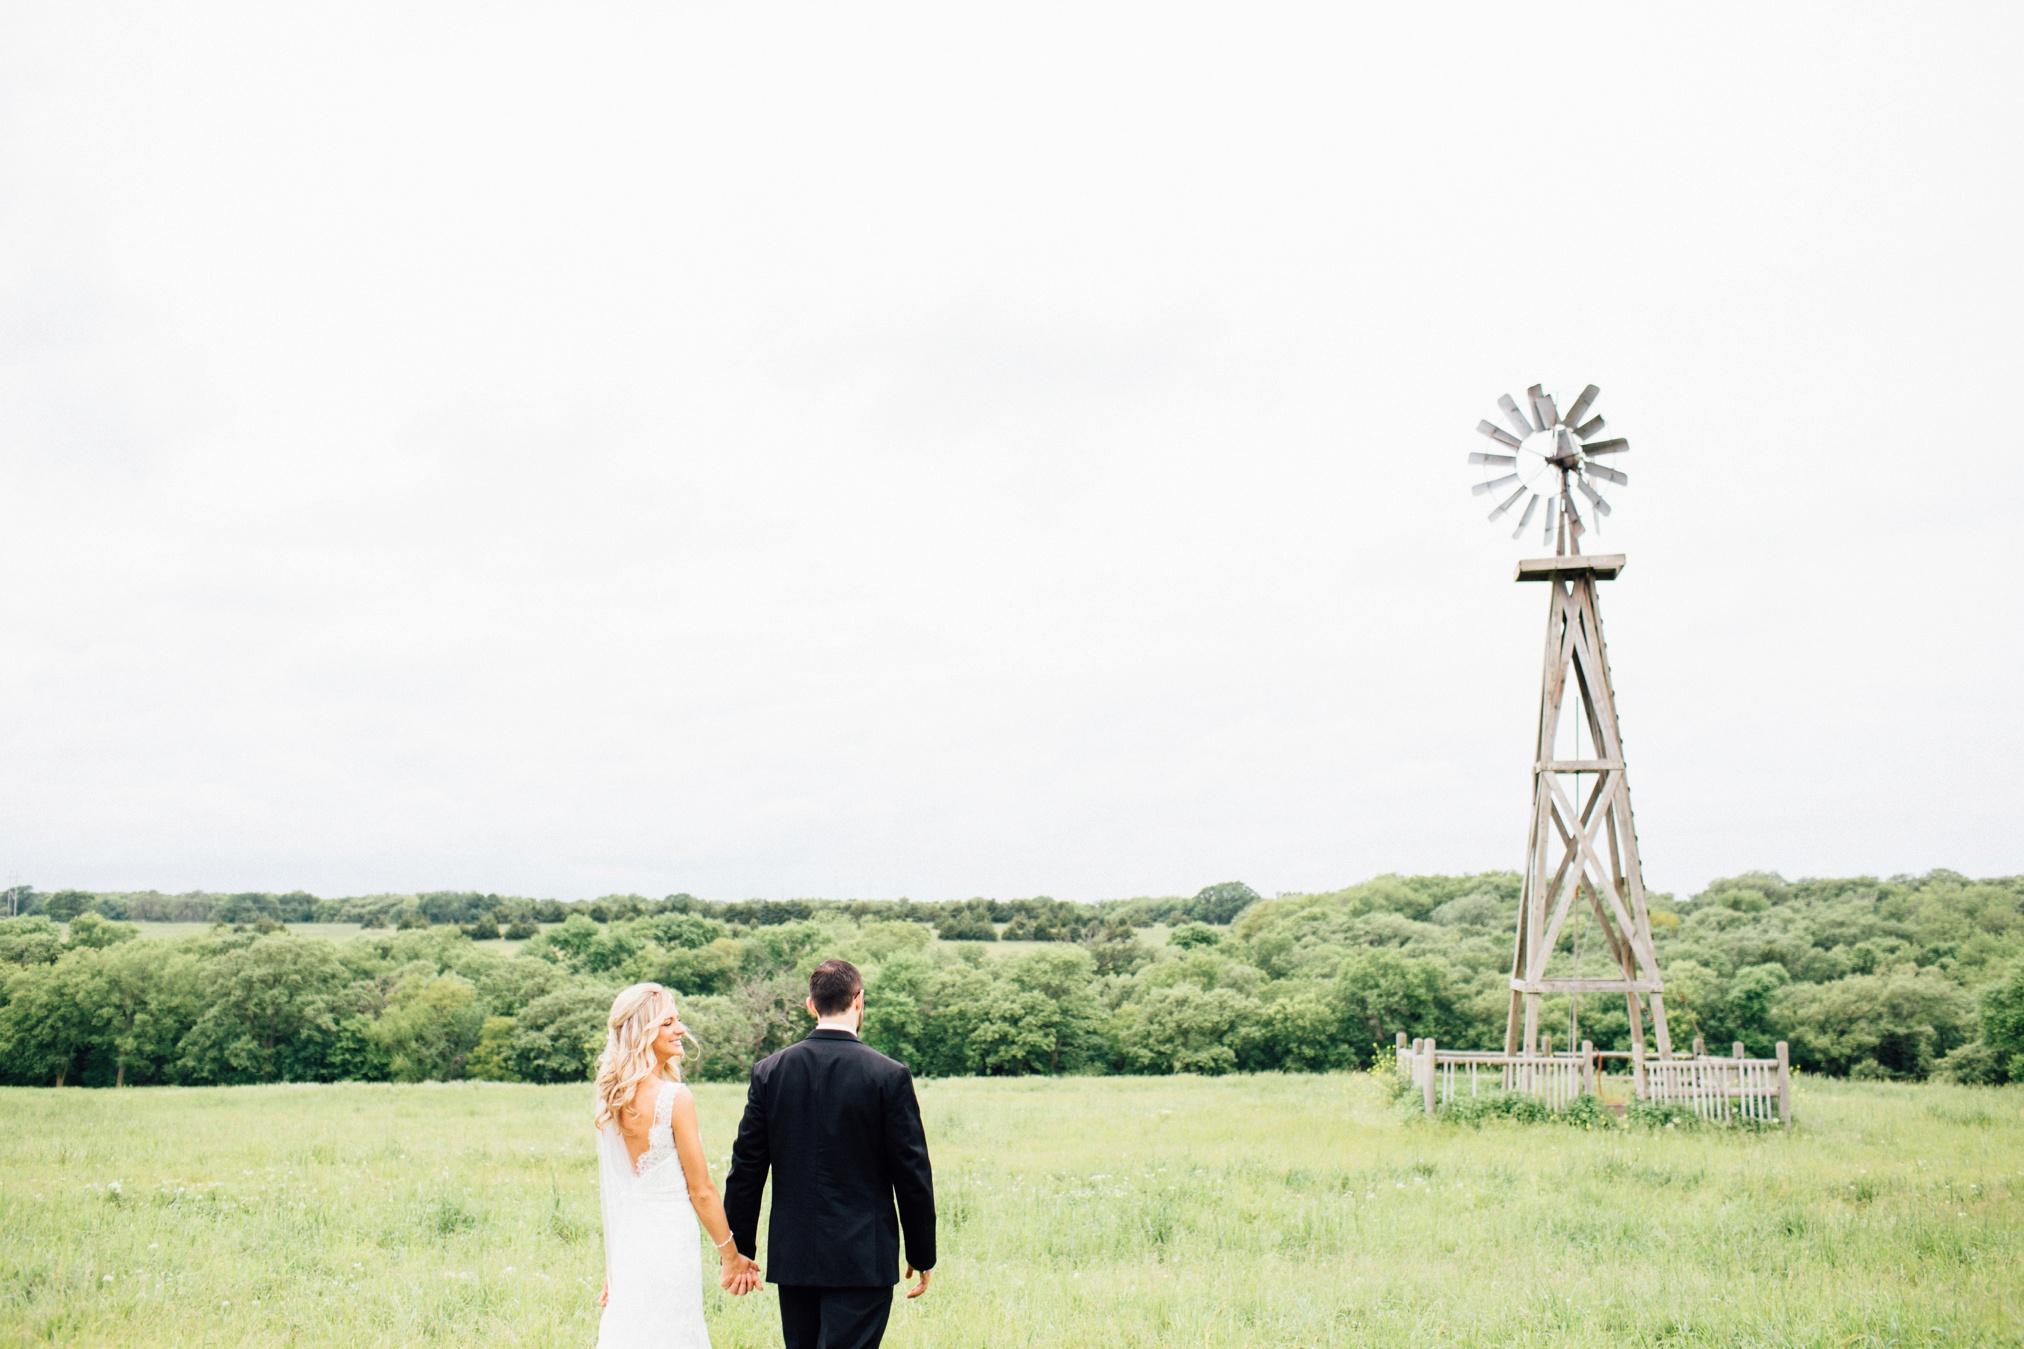 schmid_wedding-646.jpg